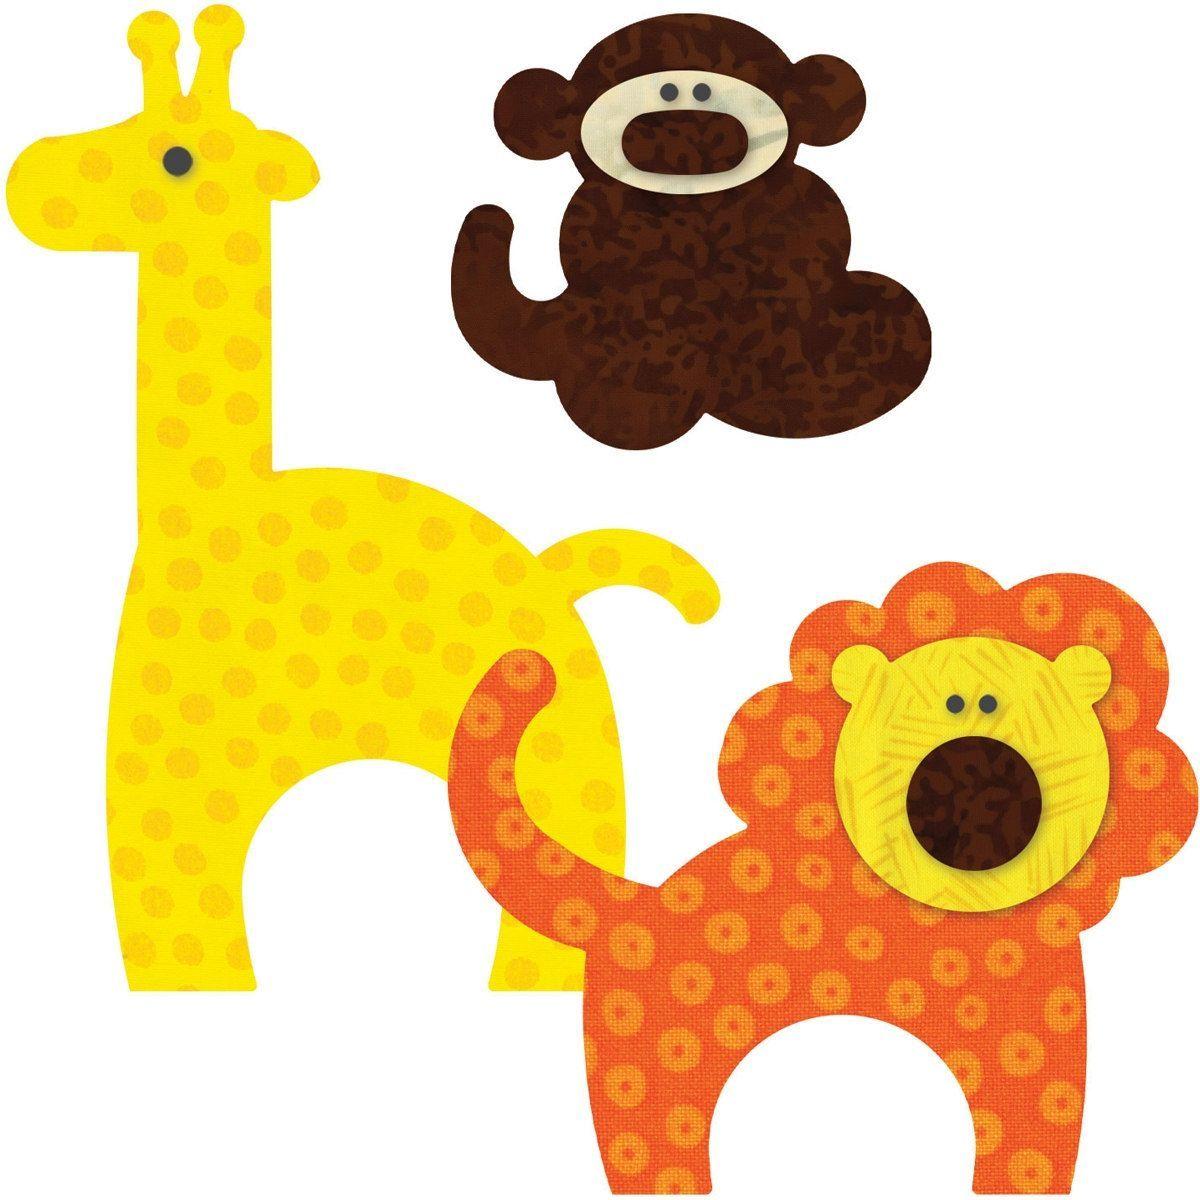 Accuquilt GO This u That Fabric Cutting DiesZoo Animals zoo